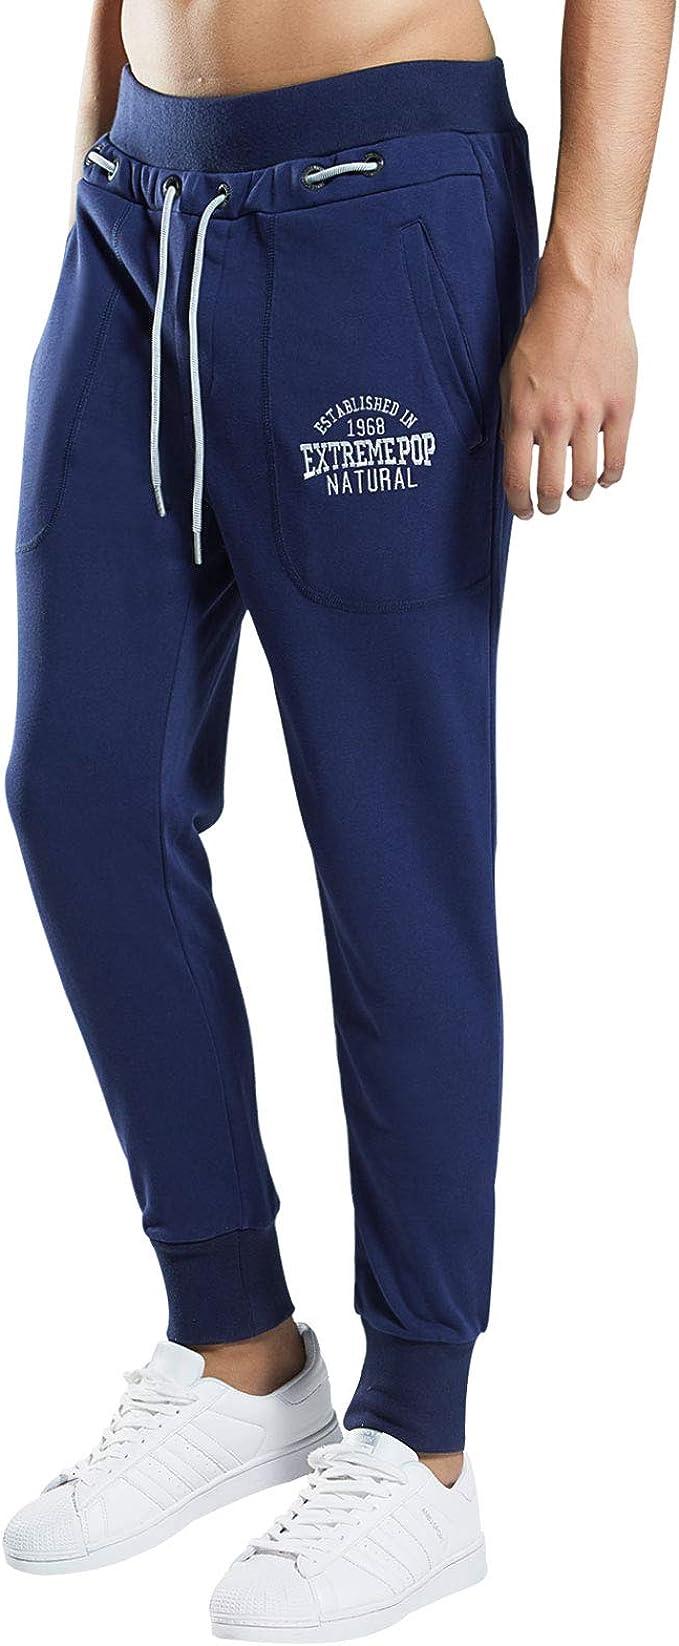 Extreme Pop Hombre Joggers atléticos Pantalones de chándal con ...